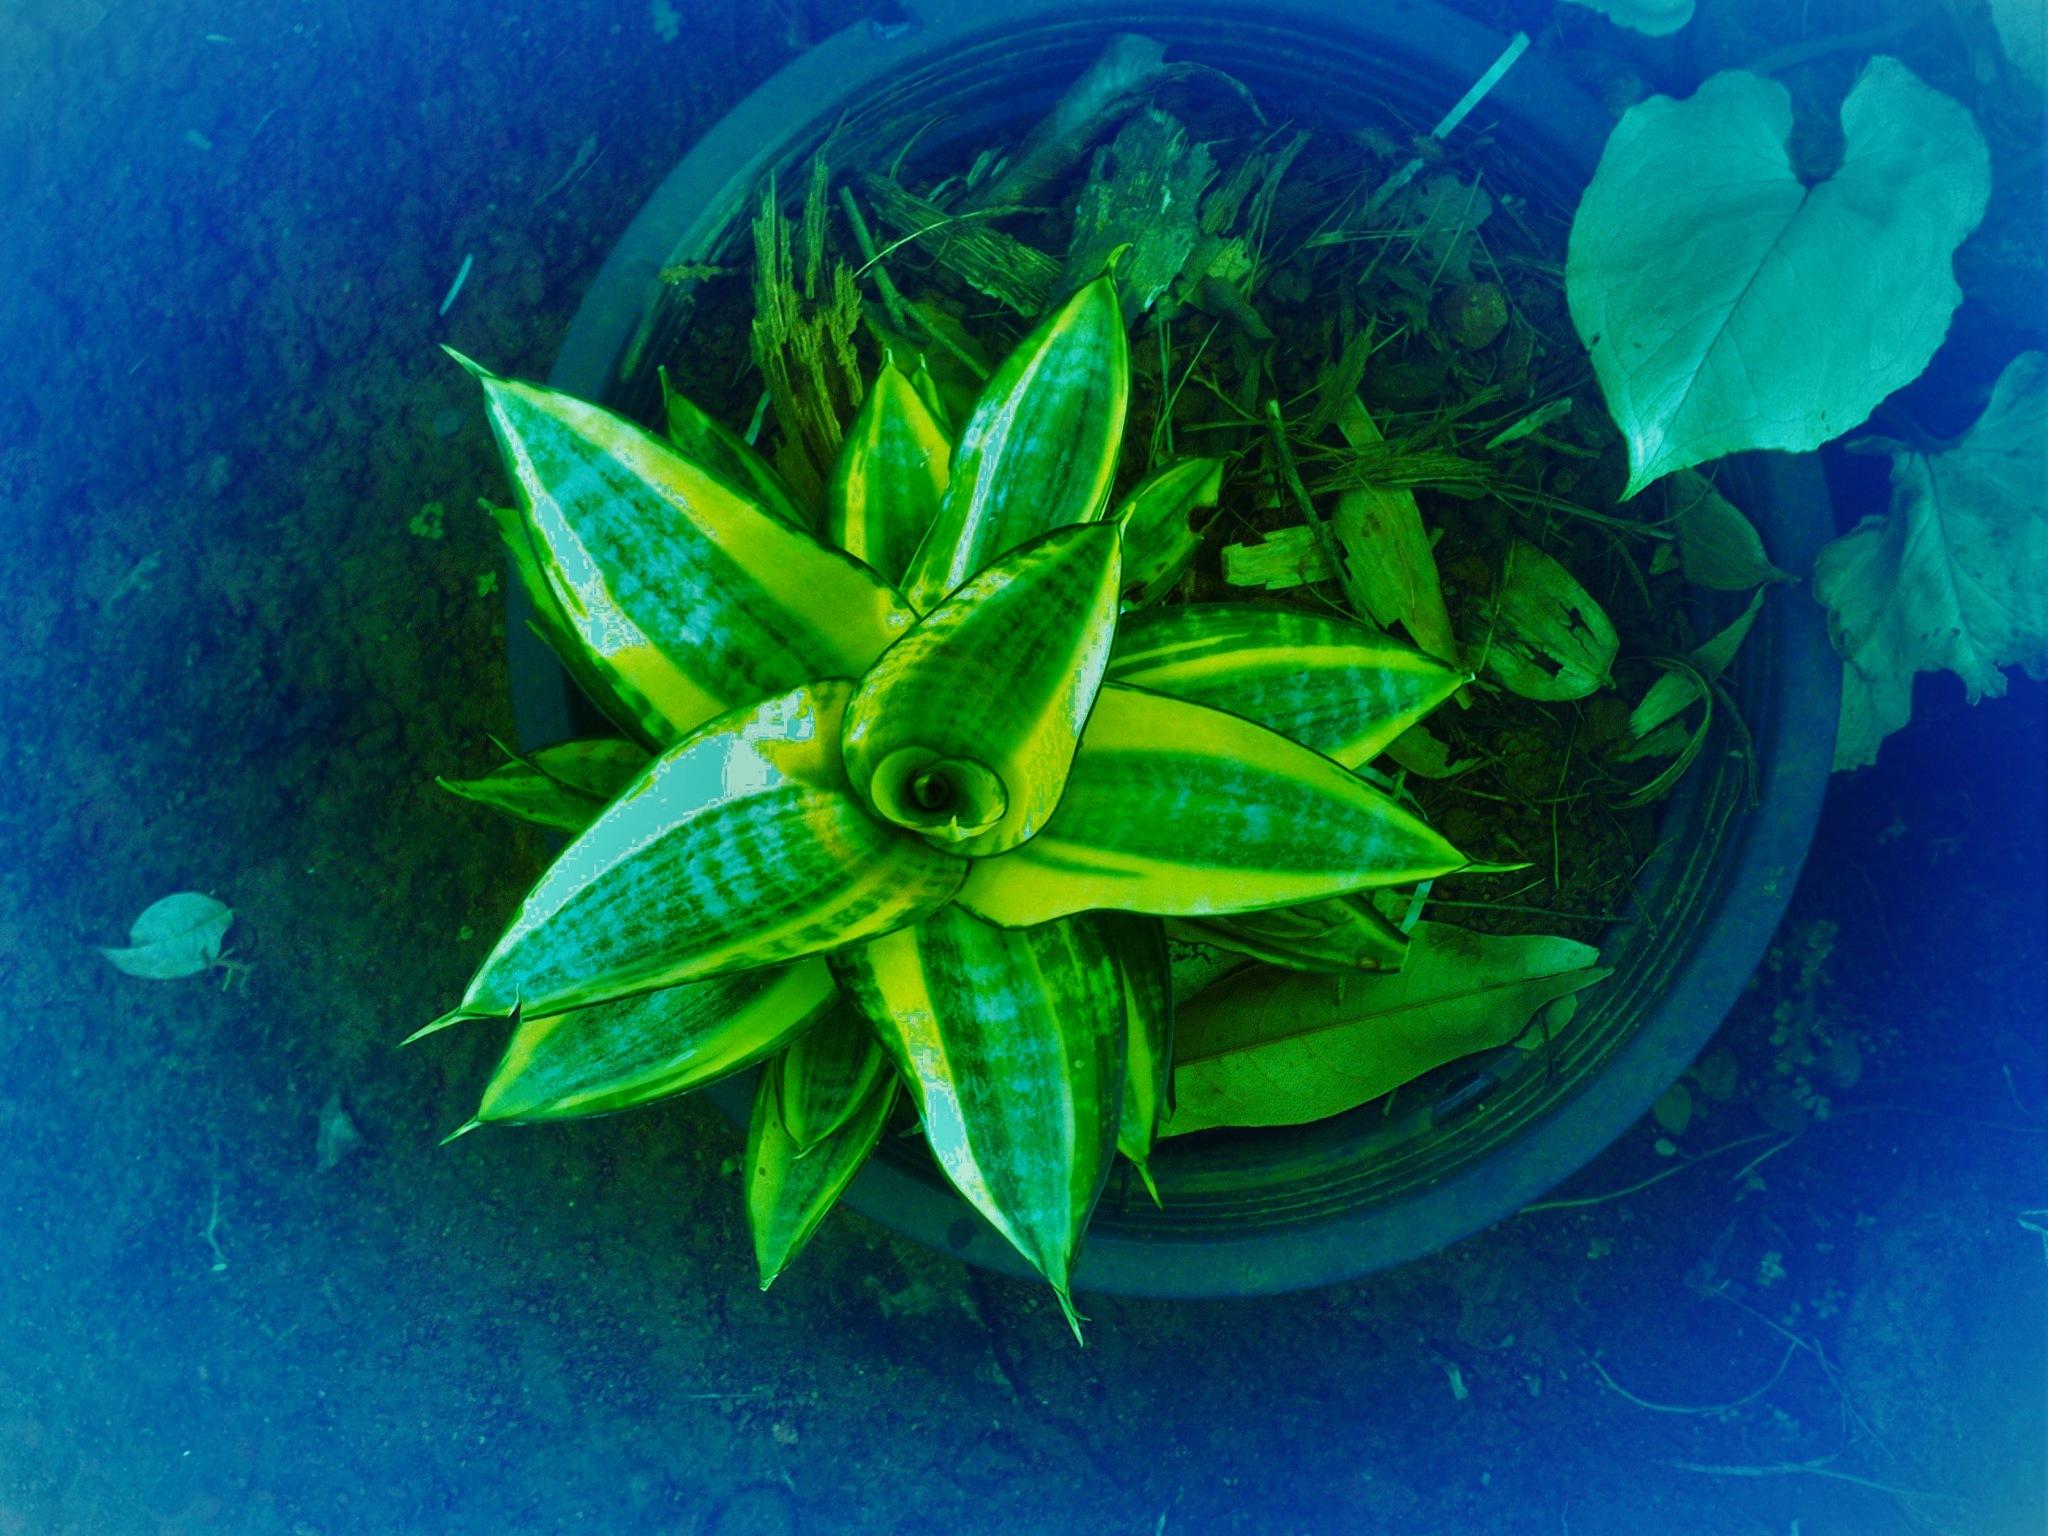 A Green Plant. by A.Samathasena